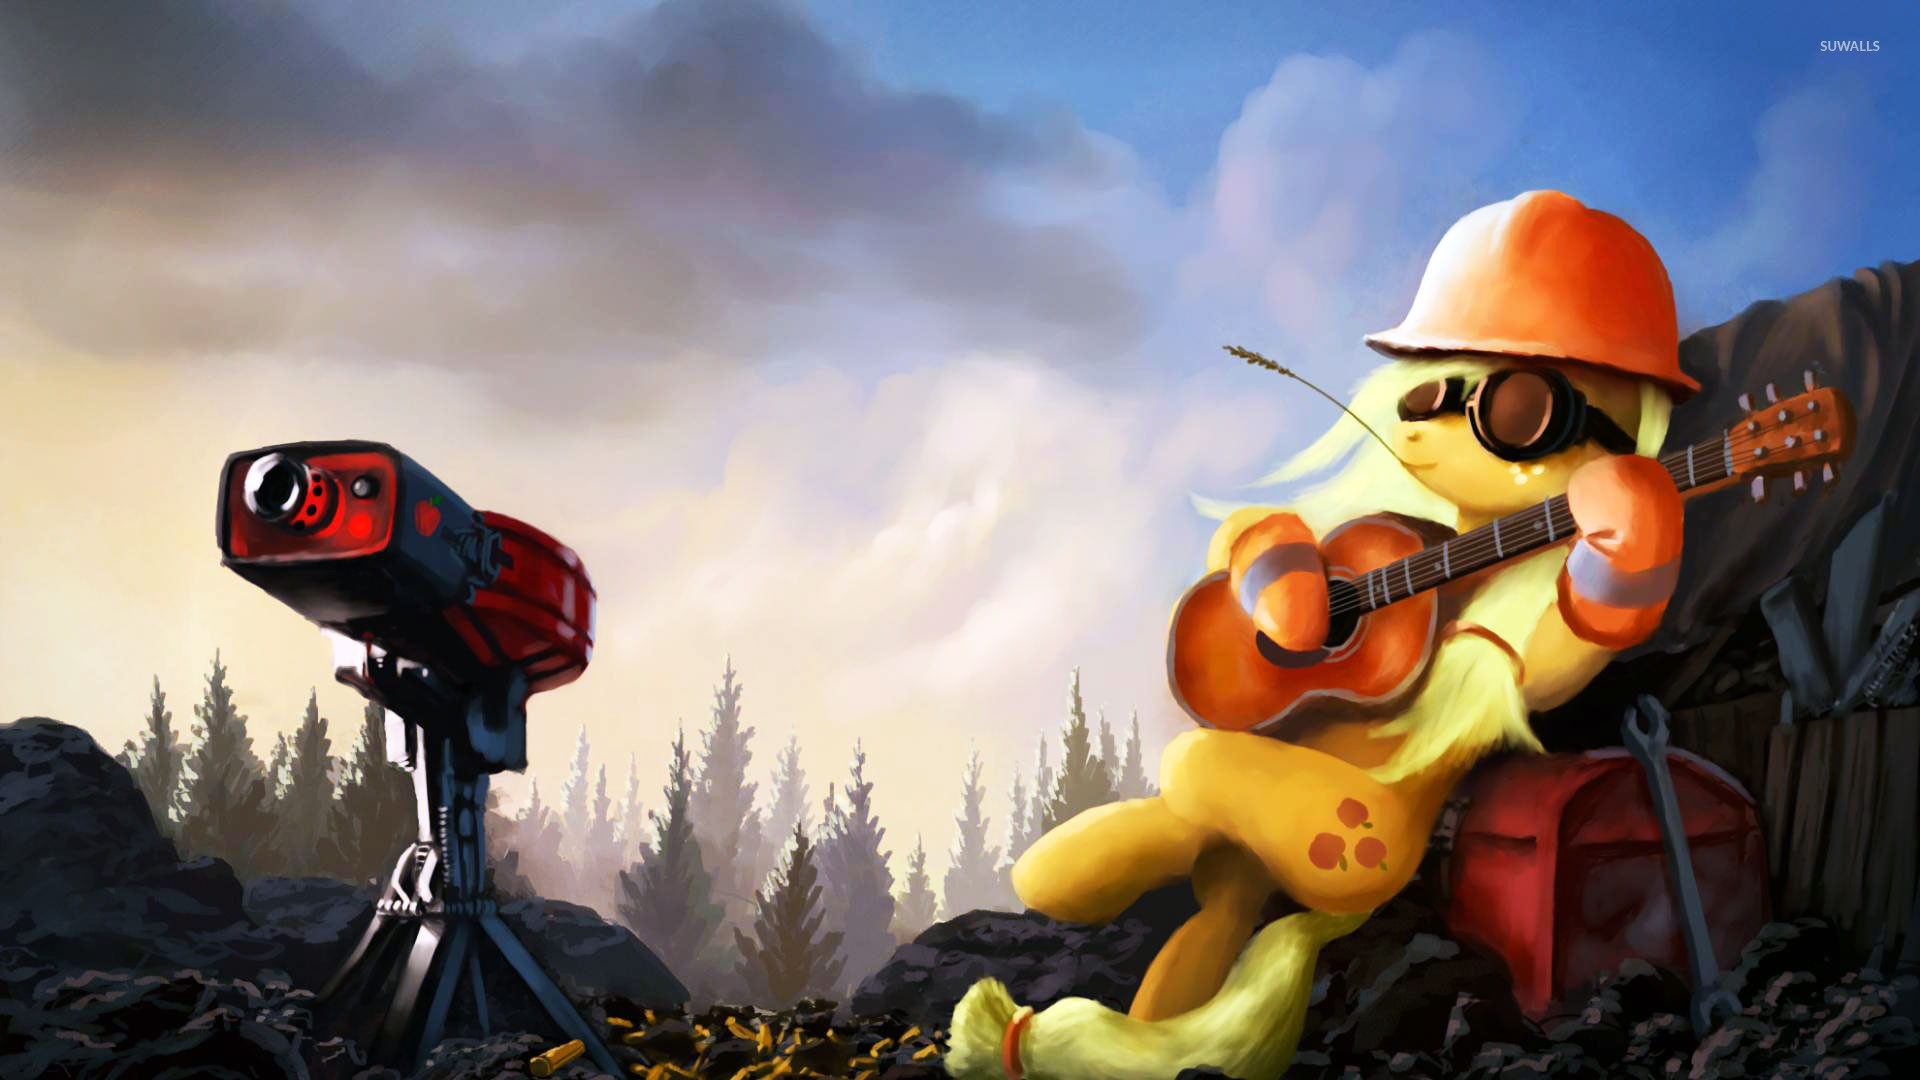 Applejack – My Little Pony Friendship is Magic wallpaper jpg